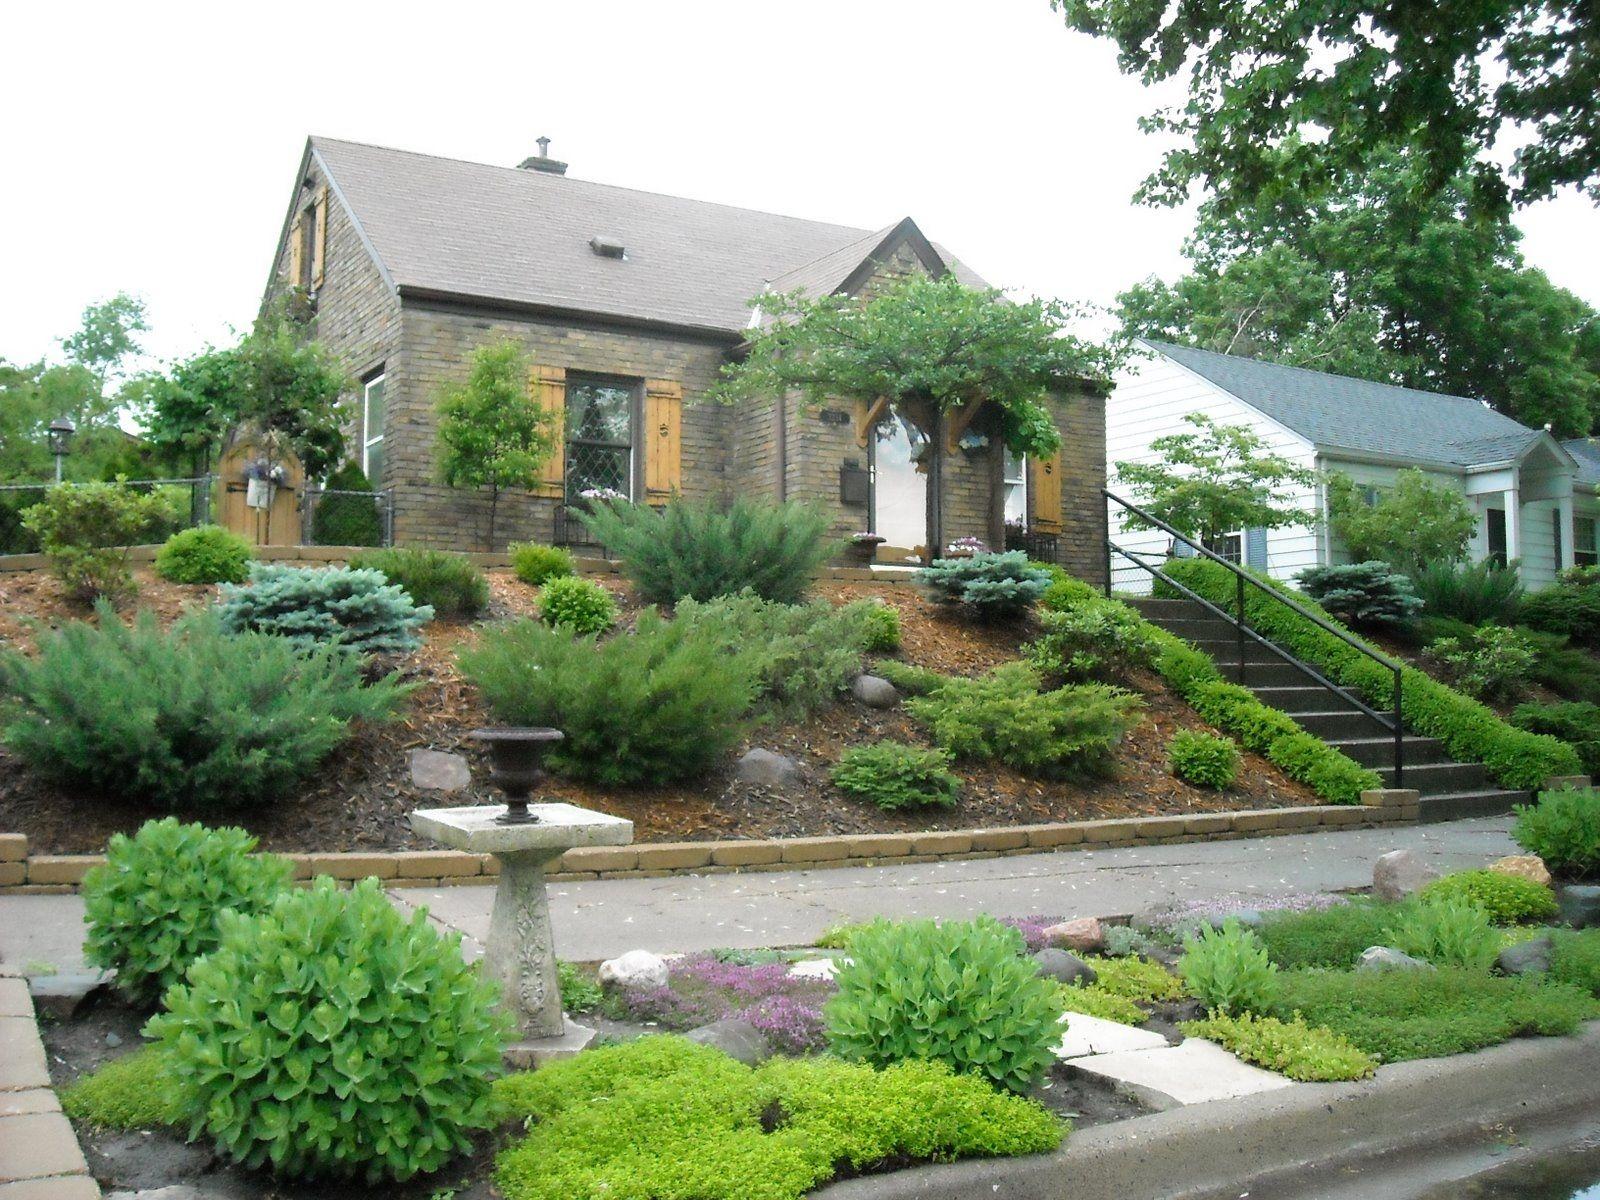 Landscape sloped back yard landscaping ideas backyard slope